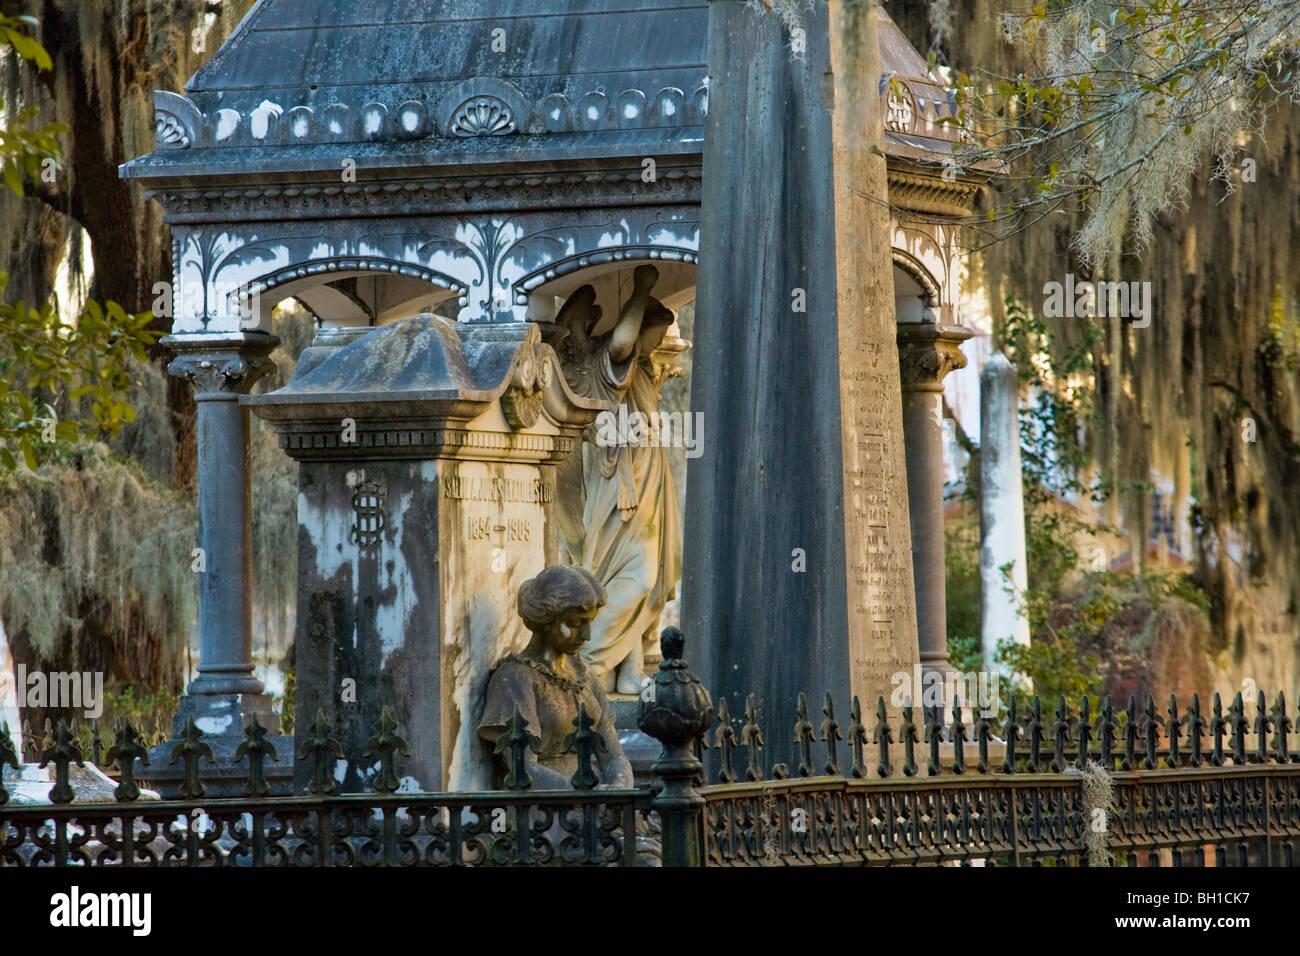 Old Live Oak Cemetery, Selma, Alabama - Stock Image